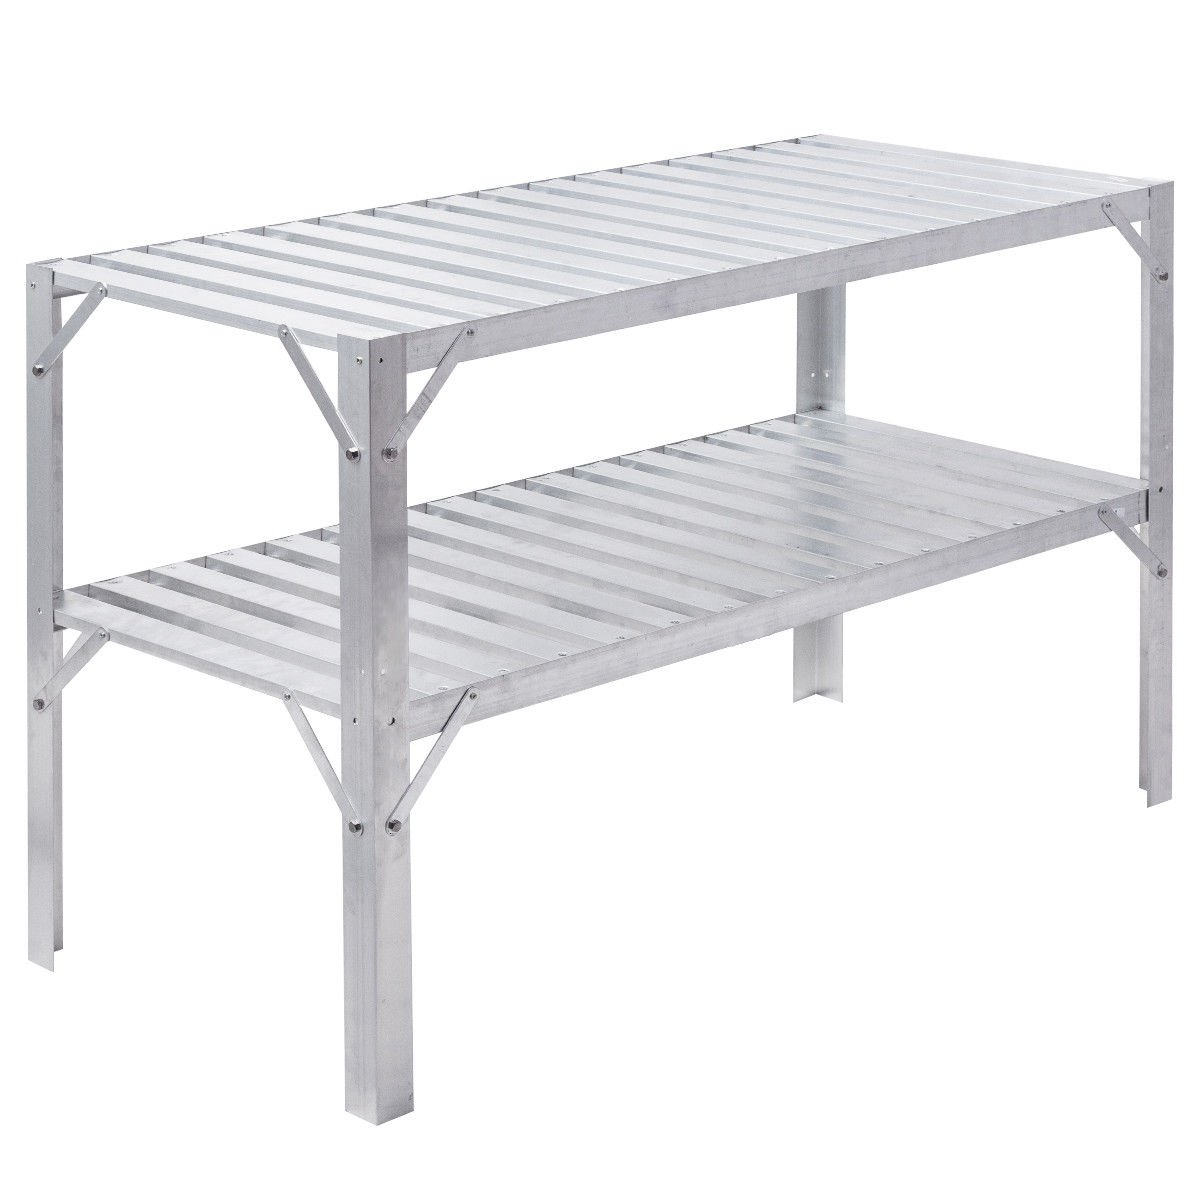 Workbench Greenhouse Prepare Aluminum Work Potting Table Storage Garage Shelves